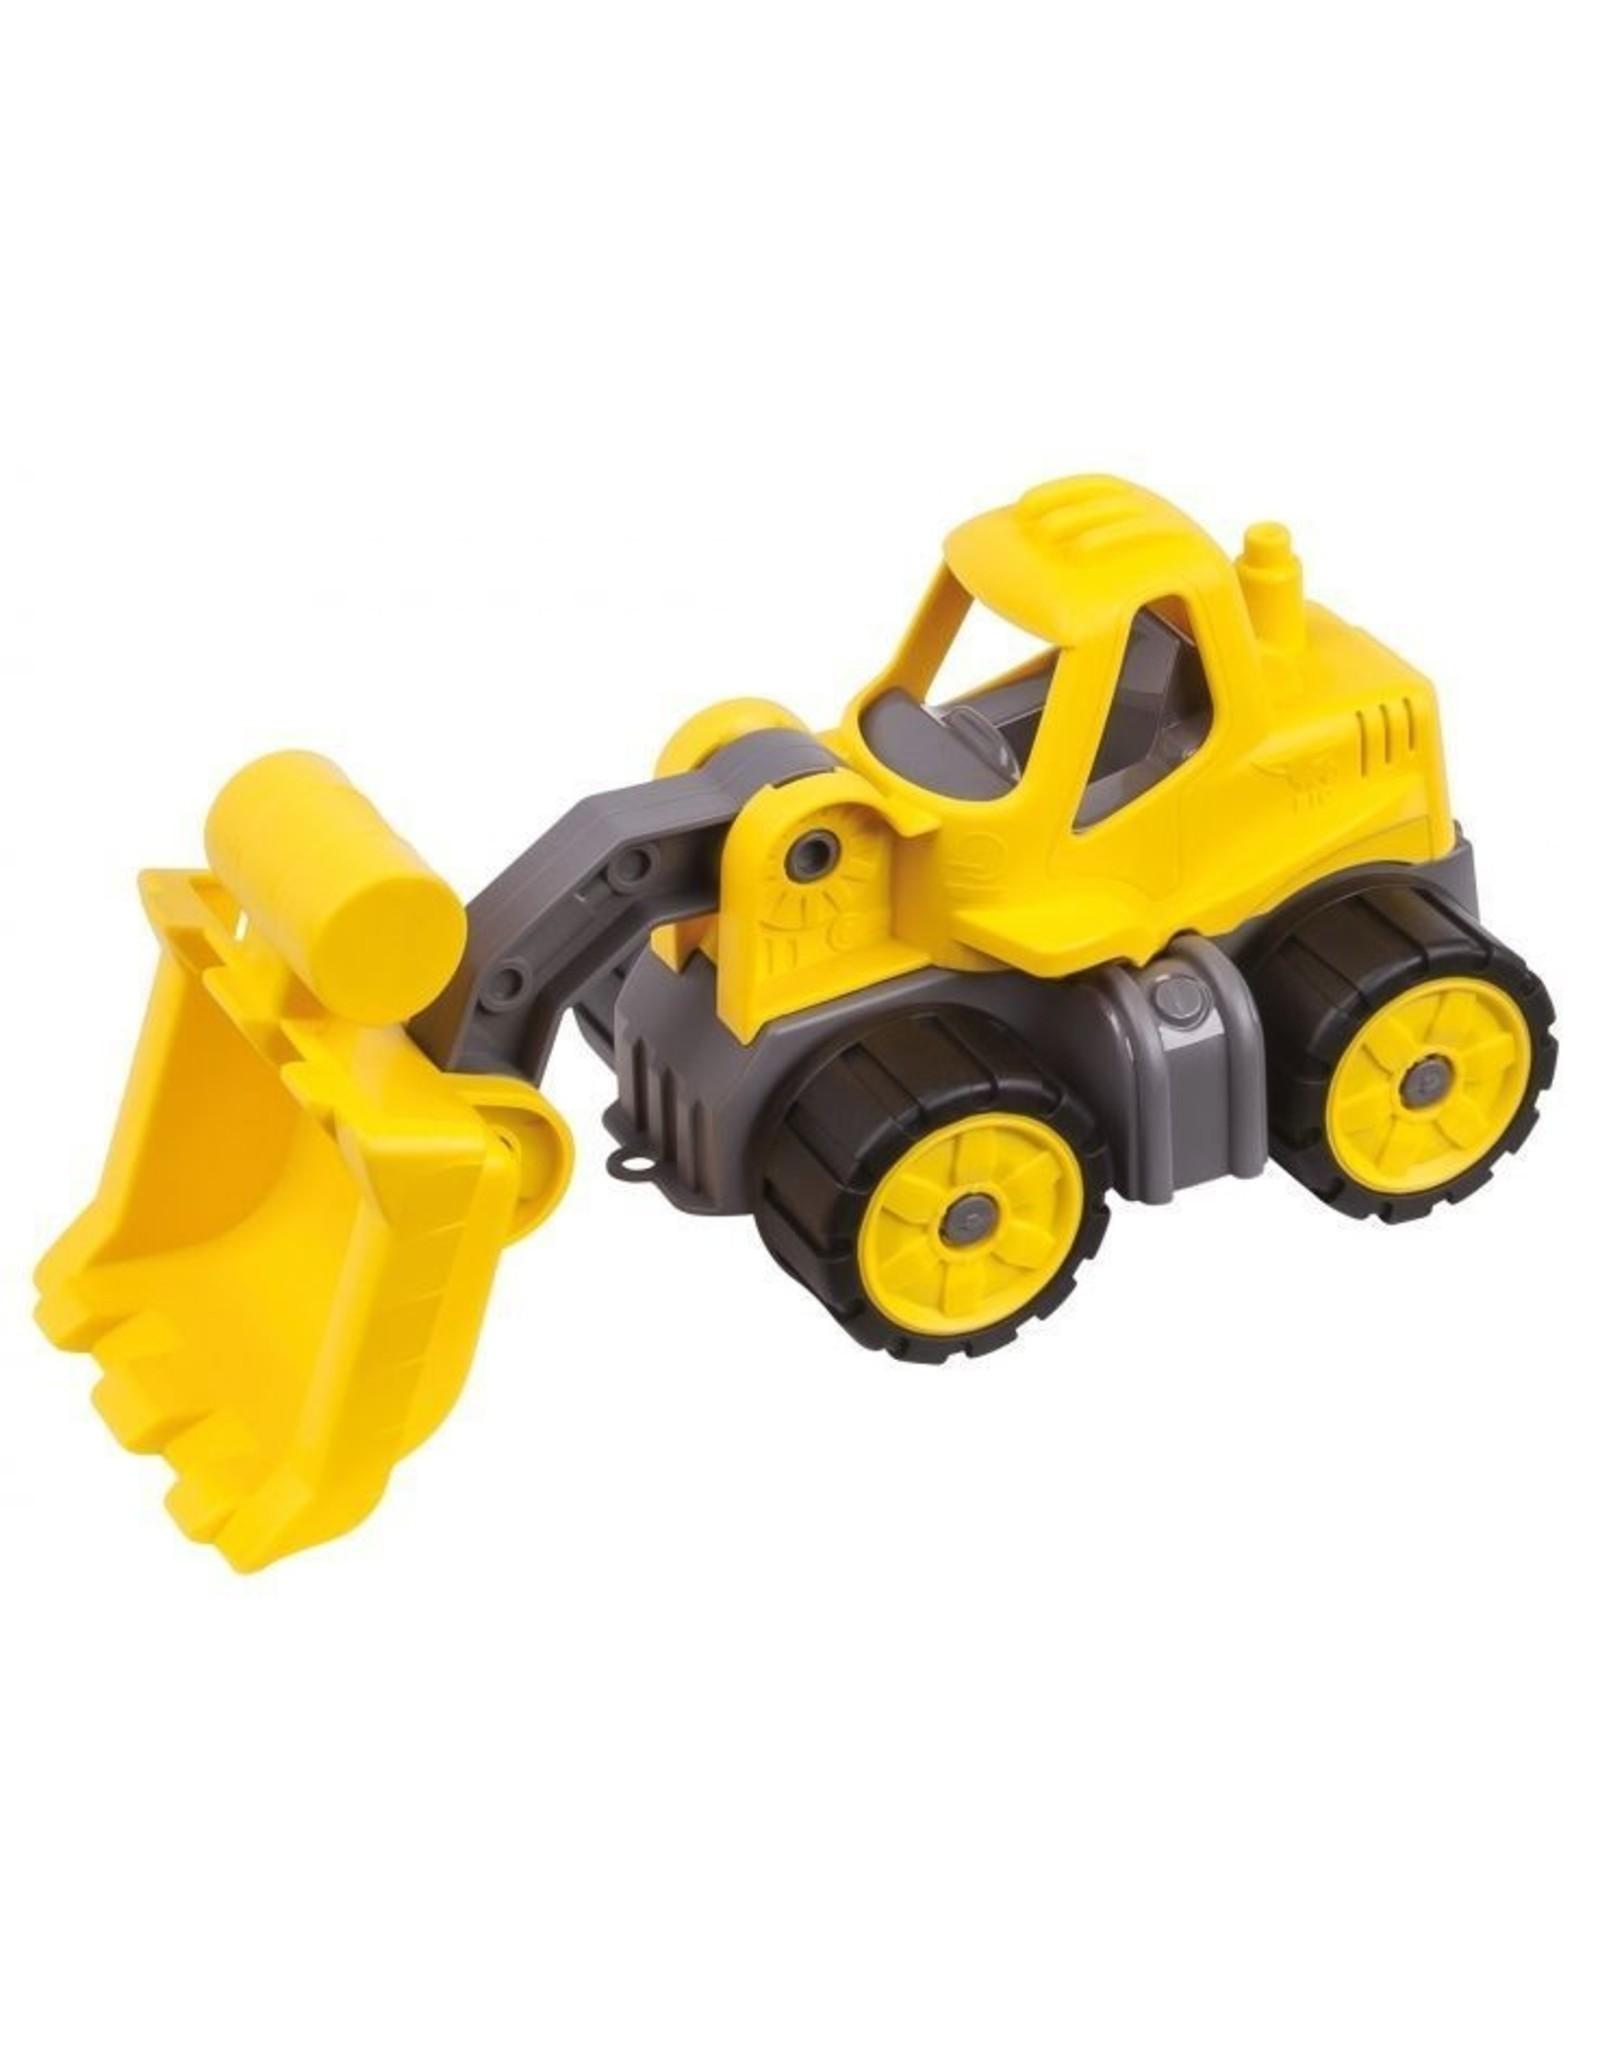 BIG BIG Power Worker Mini Shovel